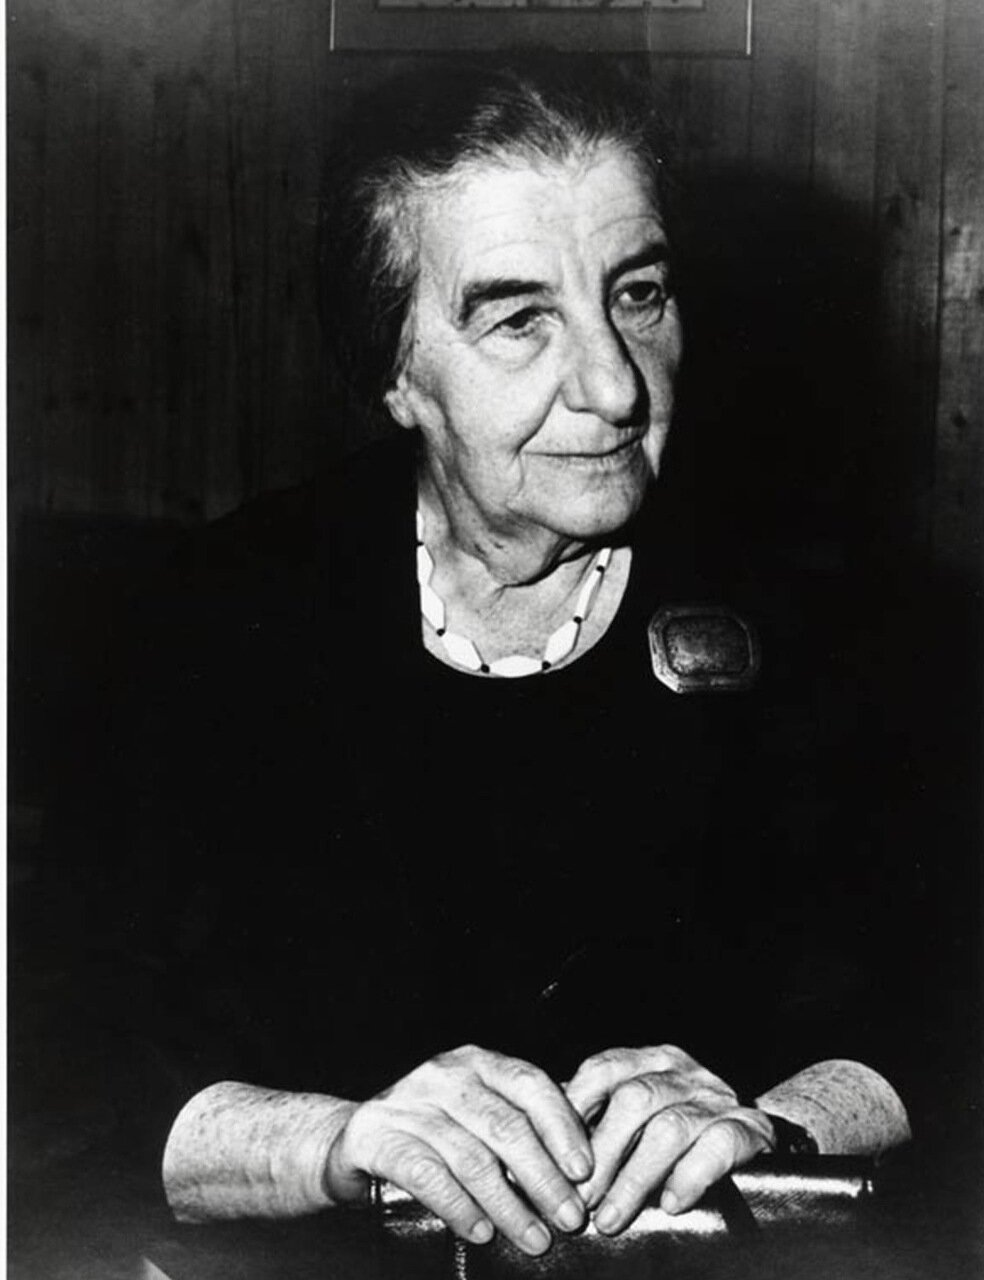 1969.  Голда Меир, премьер-министр